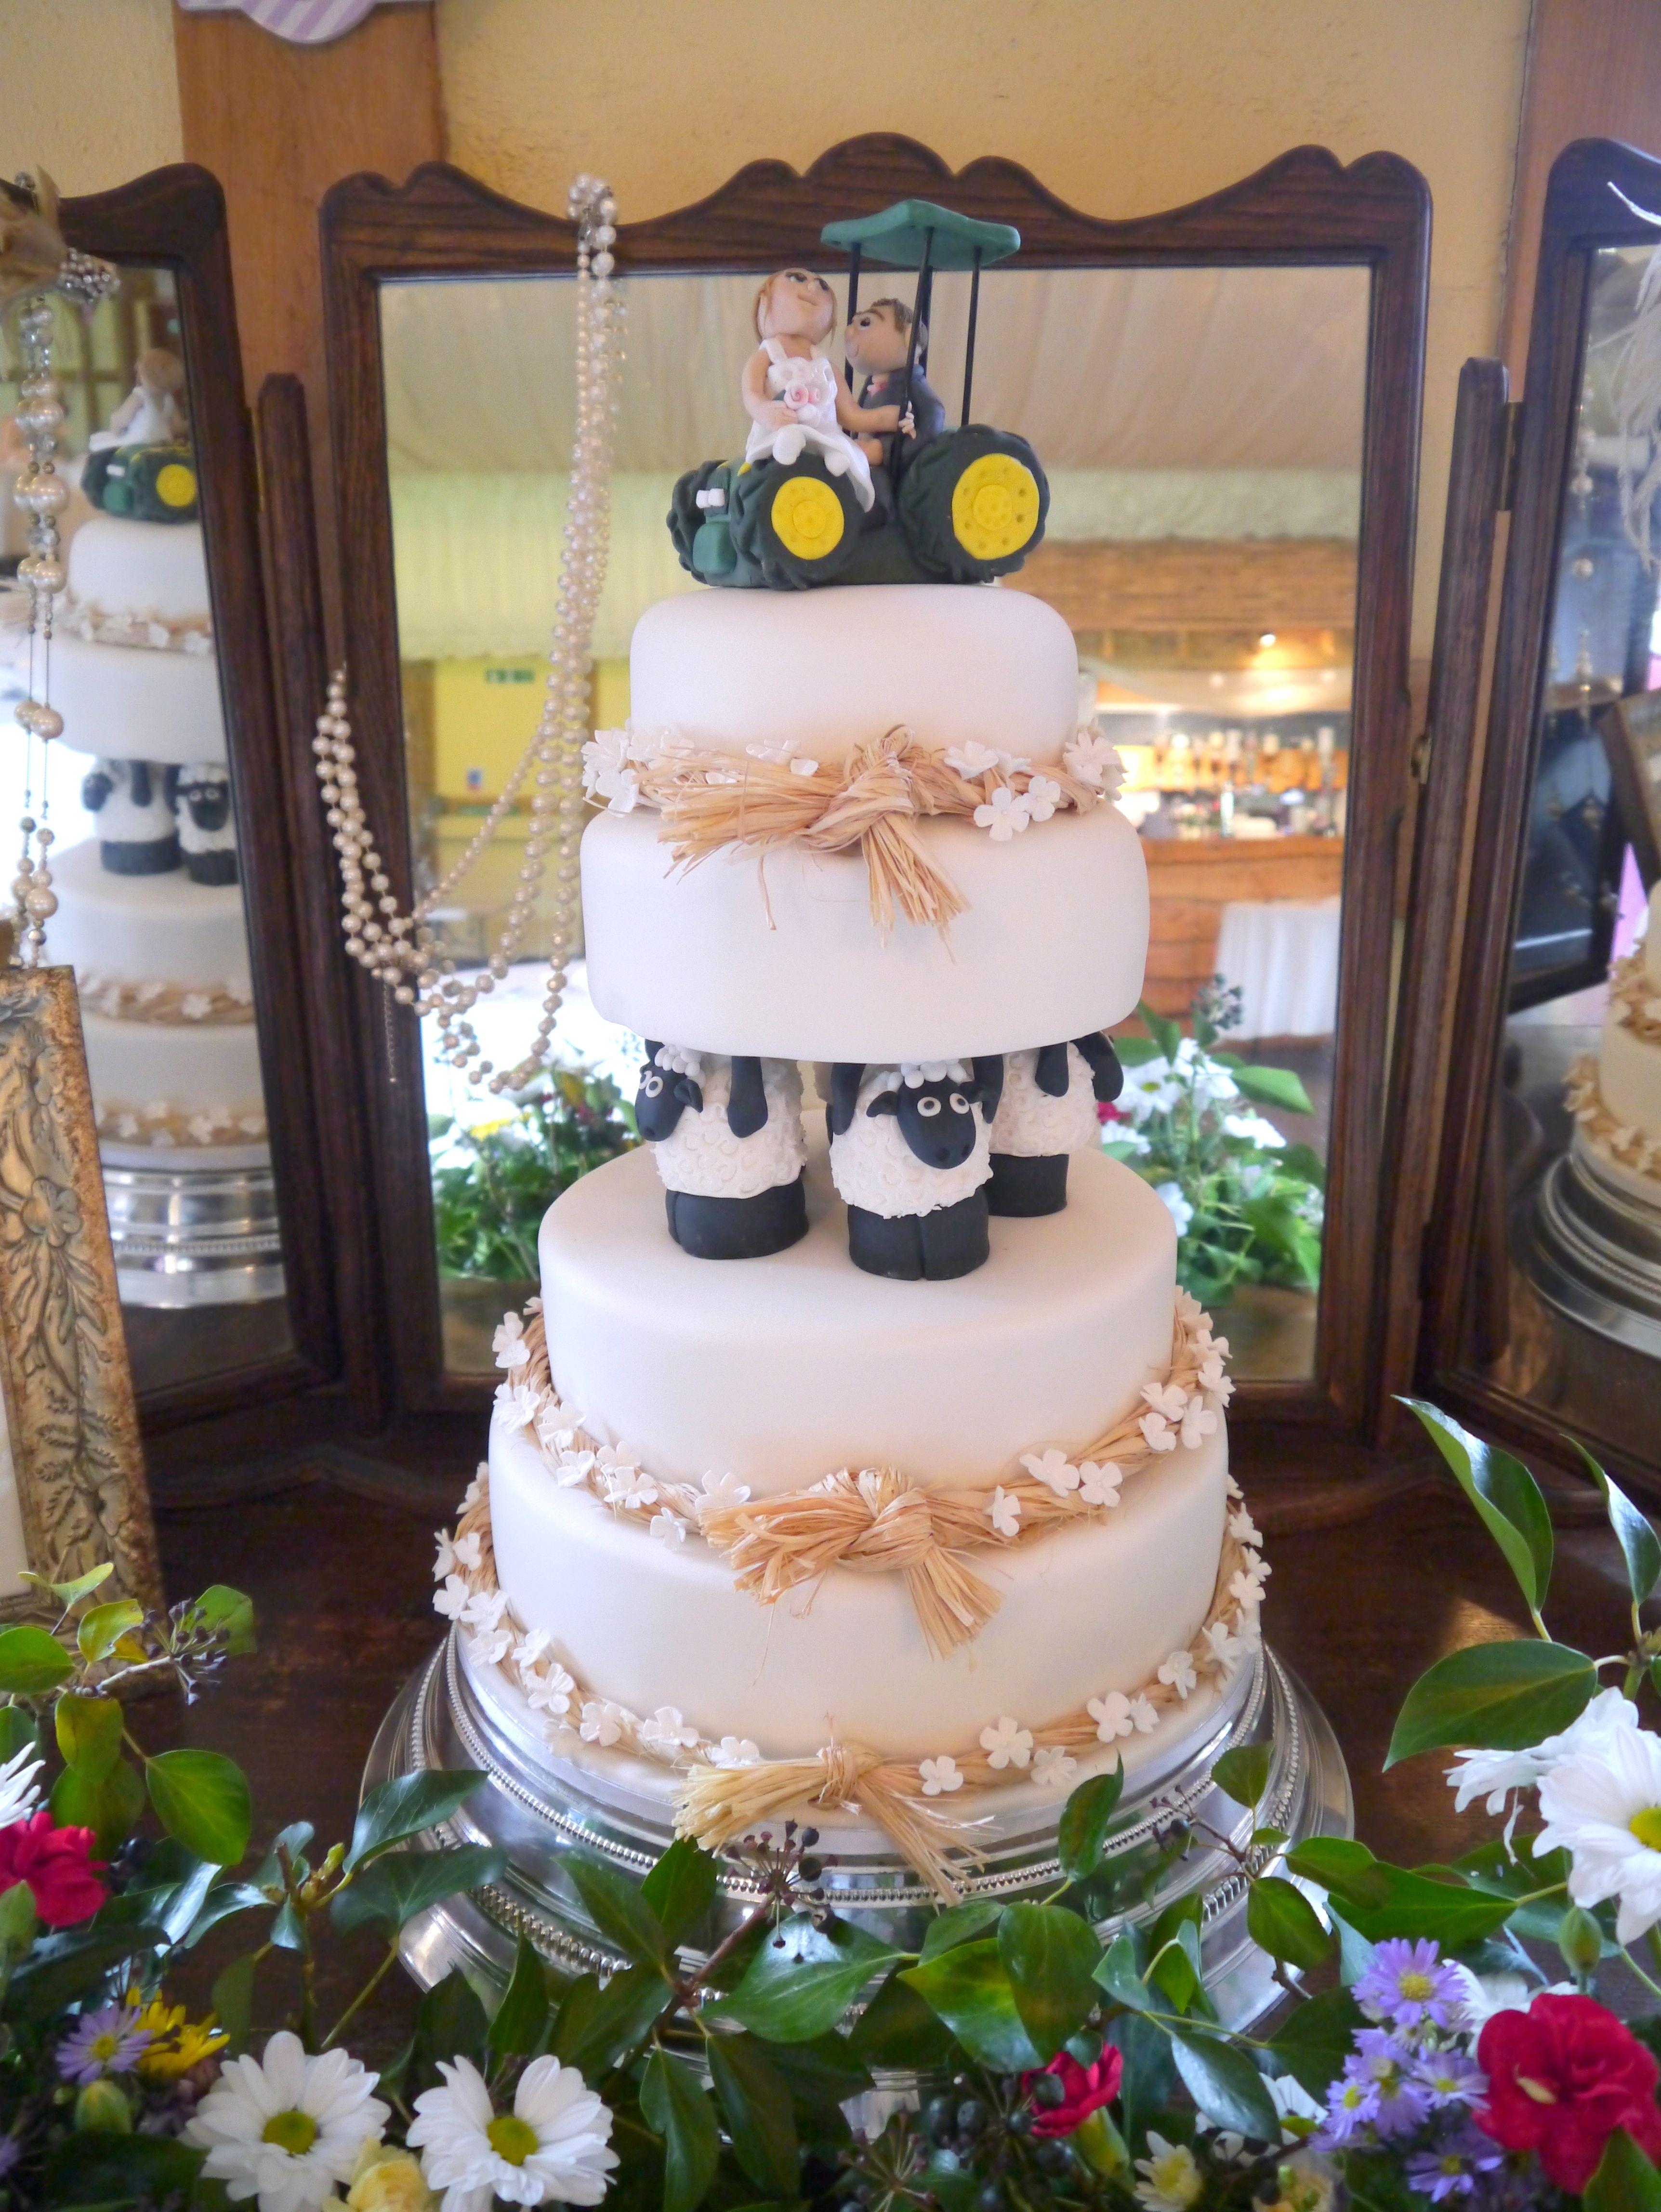 Rustic Country John Deere Farmers Wedding Cake | wedding | Pinterest ...